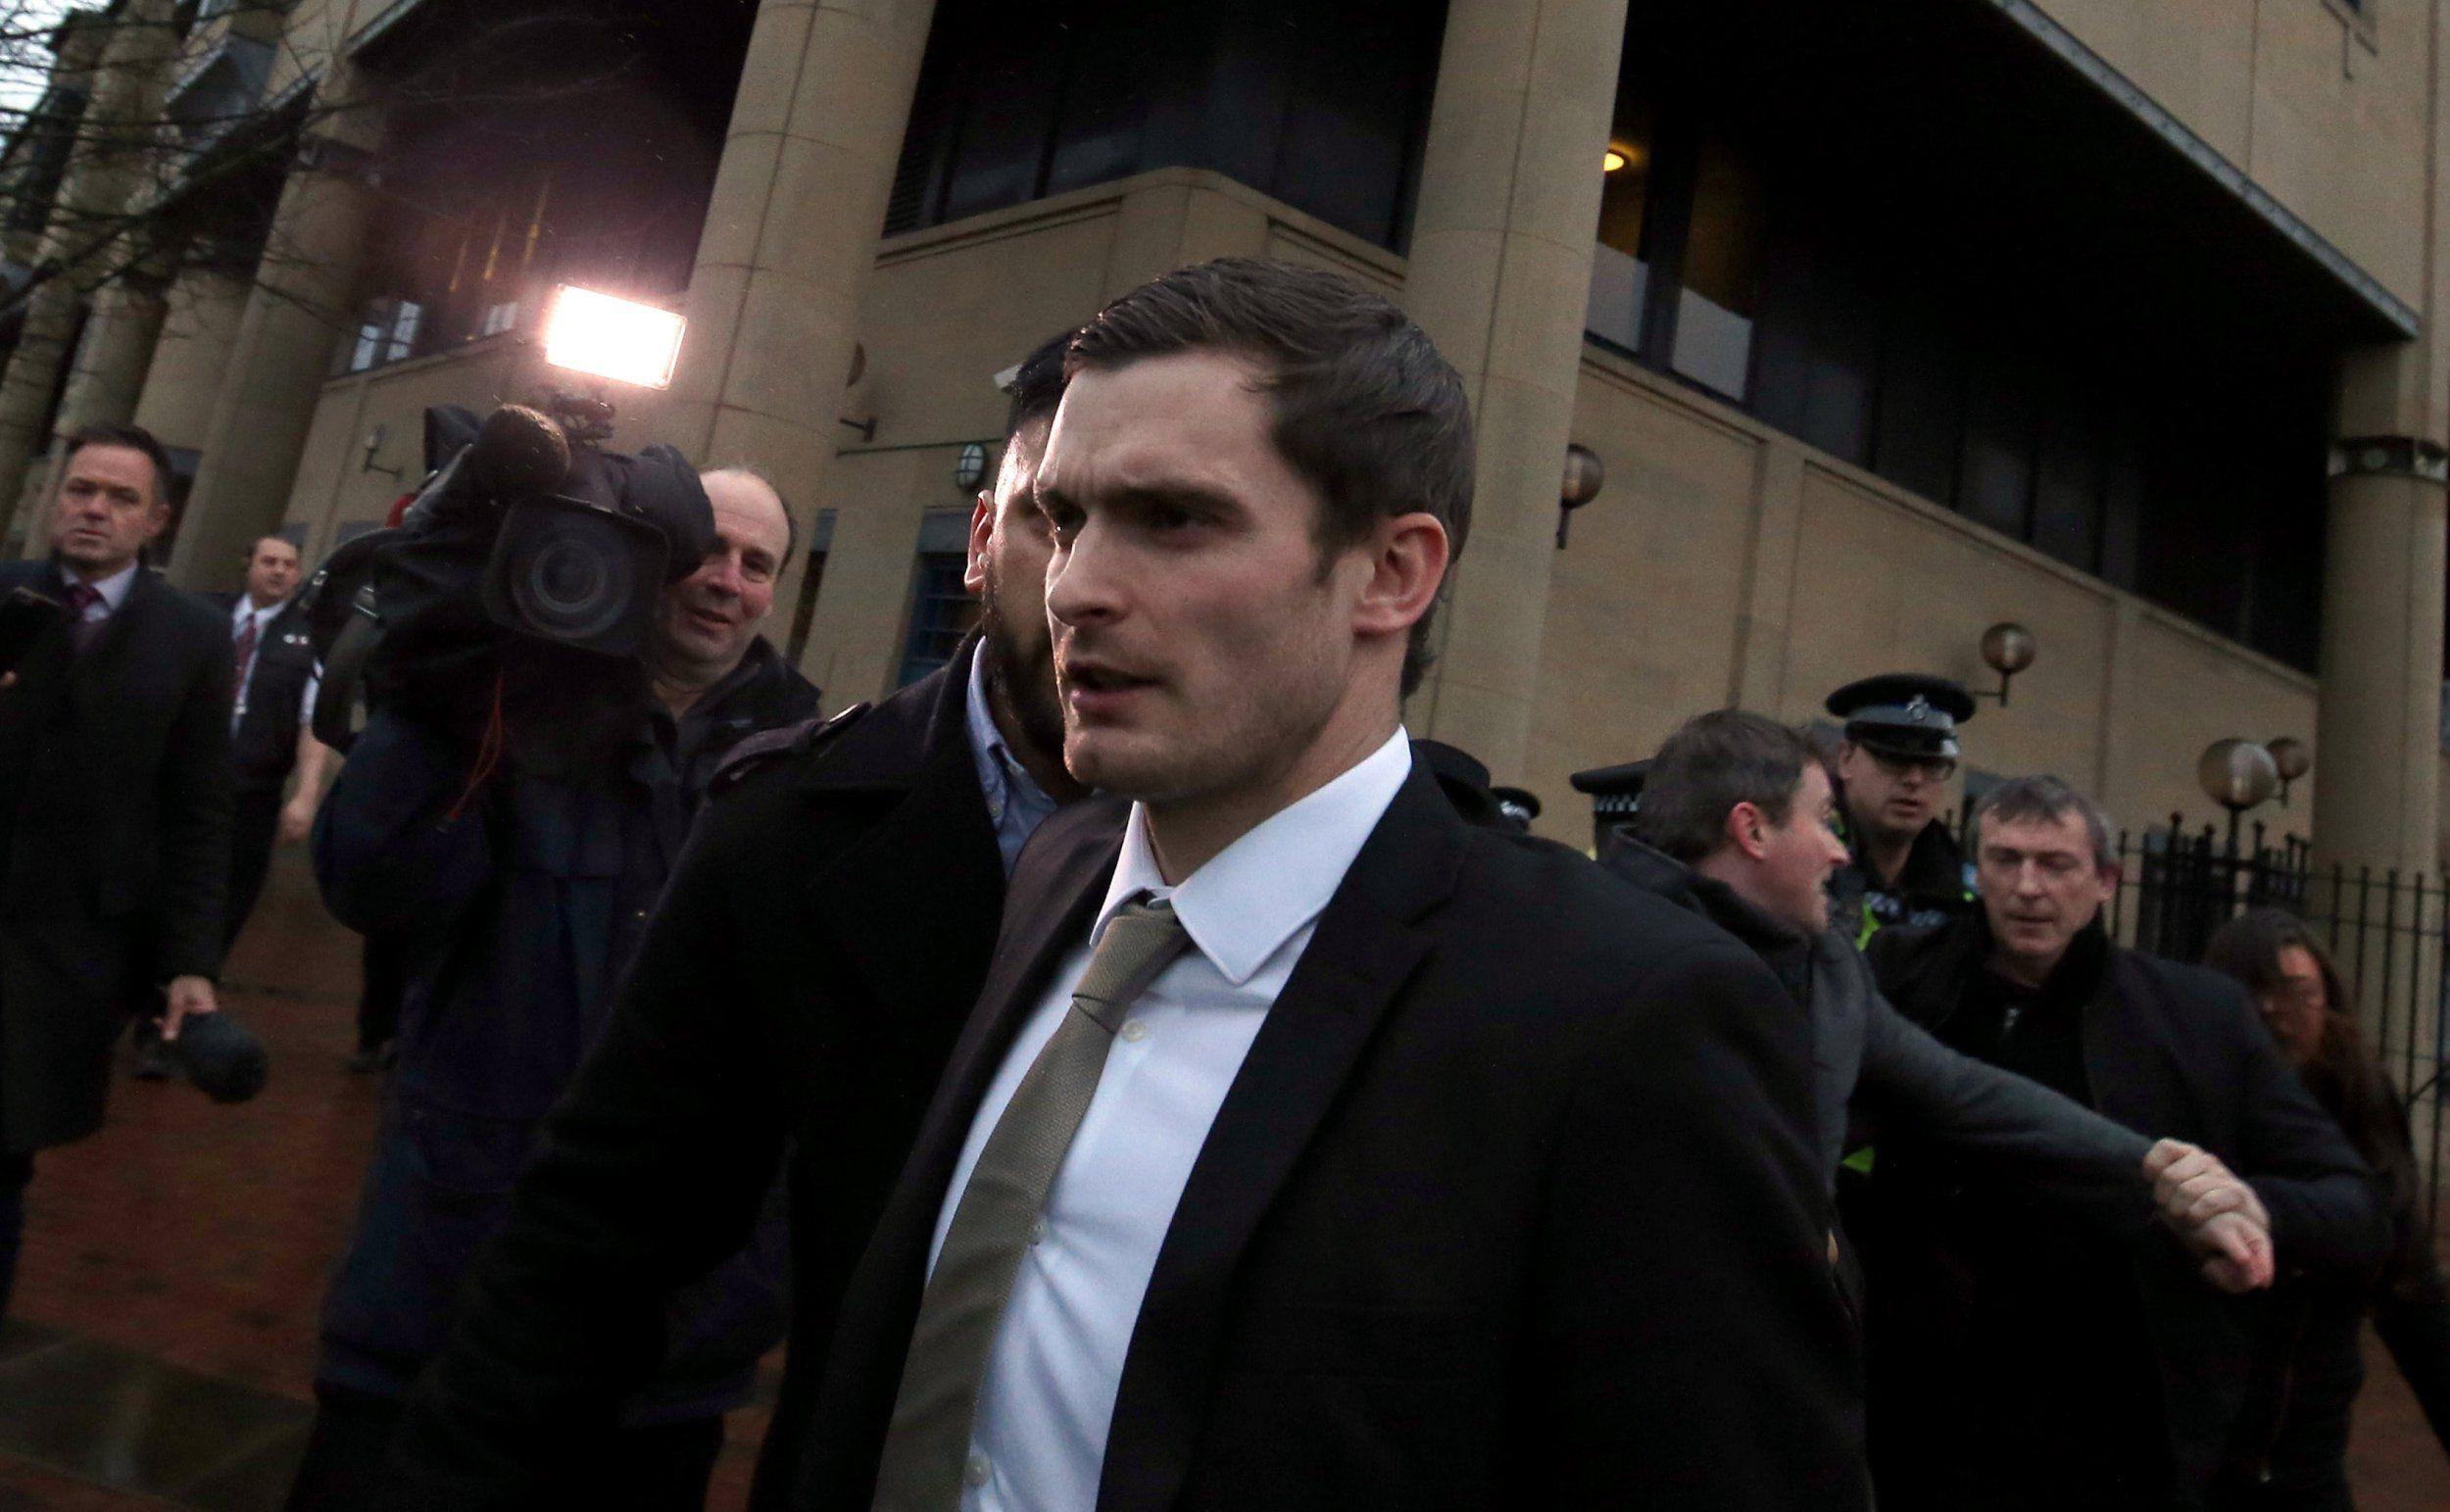 Adam Johnson launches fresh appeal against child sex conviction